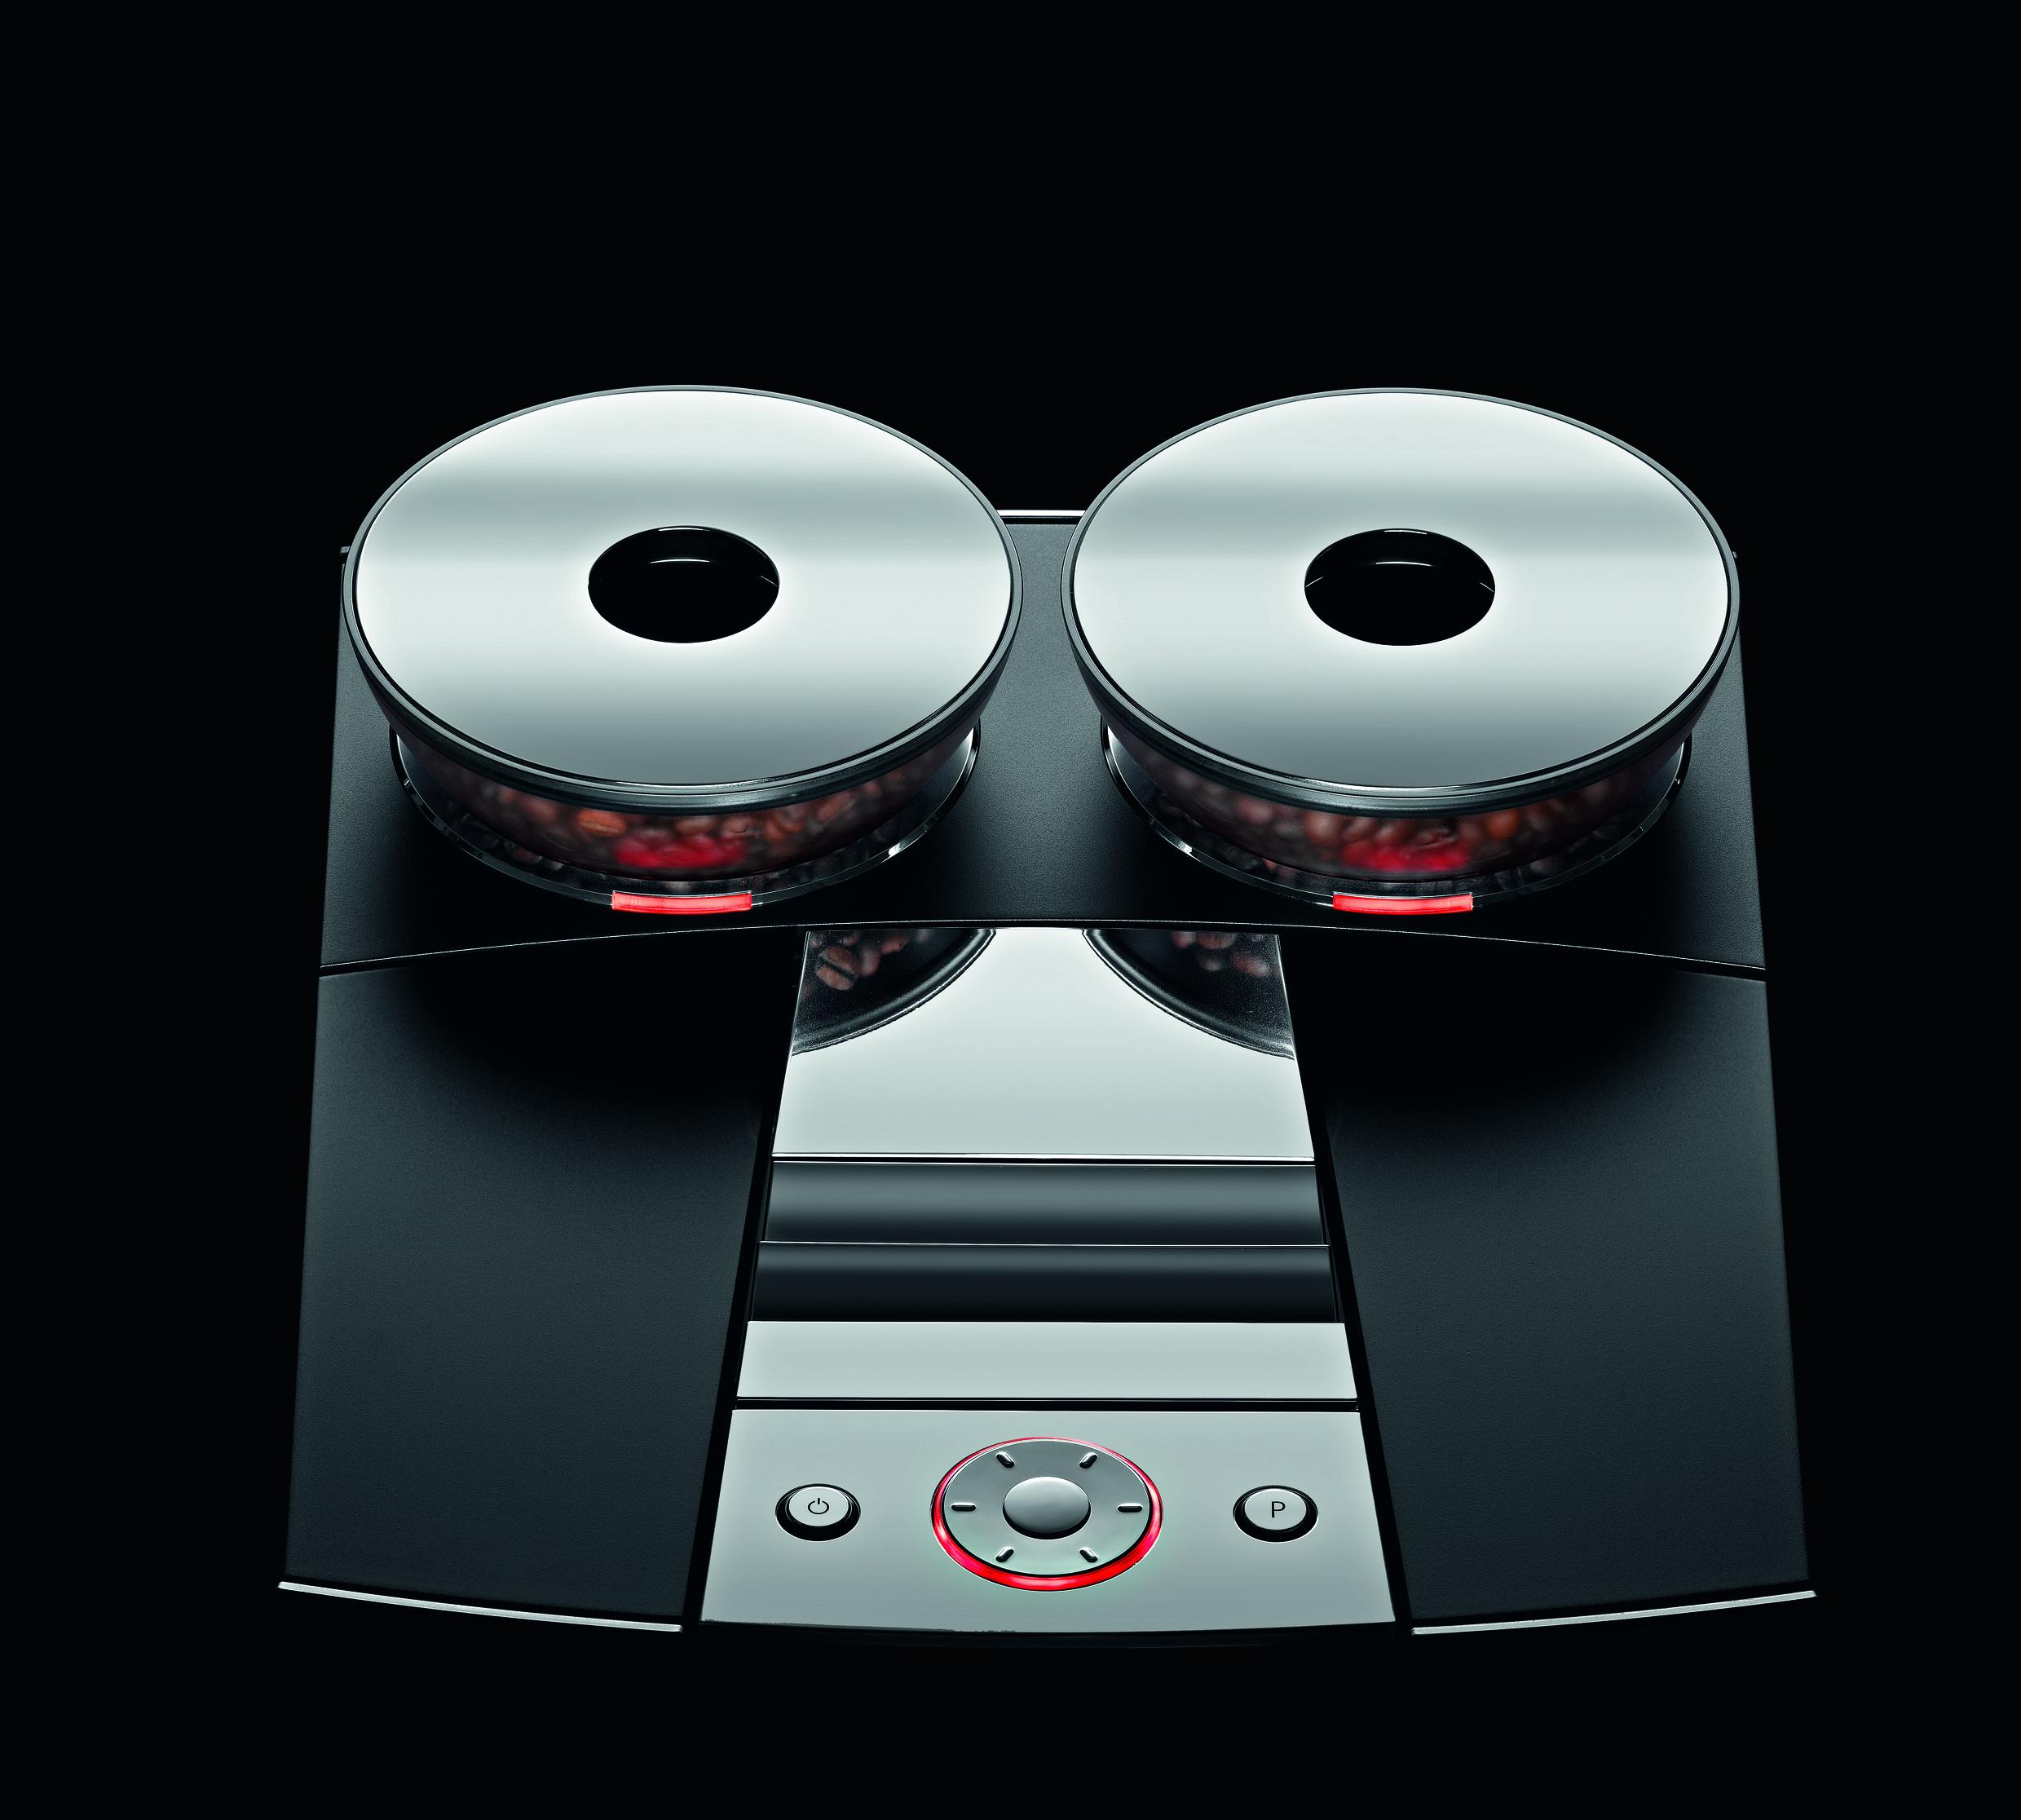 jura giga 5 for sale jura coffee maker 1st in coffee. Black Bedroom Furniture Sets. Home Design Ideas